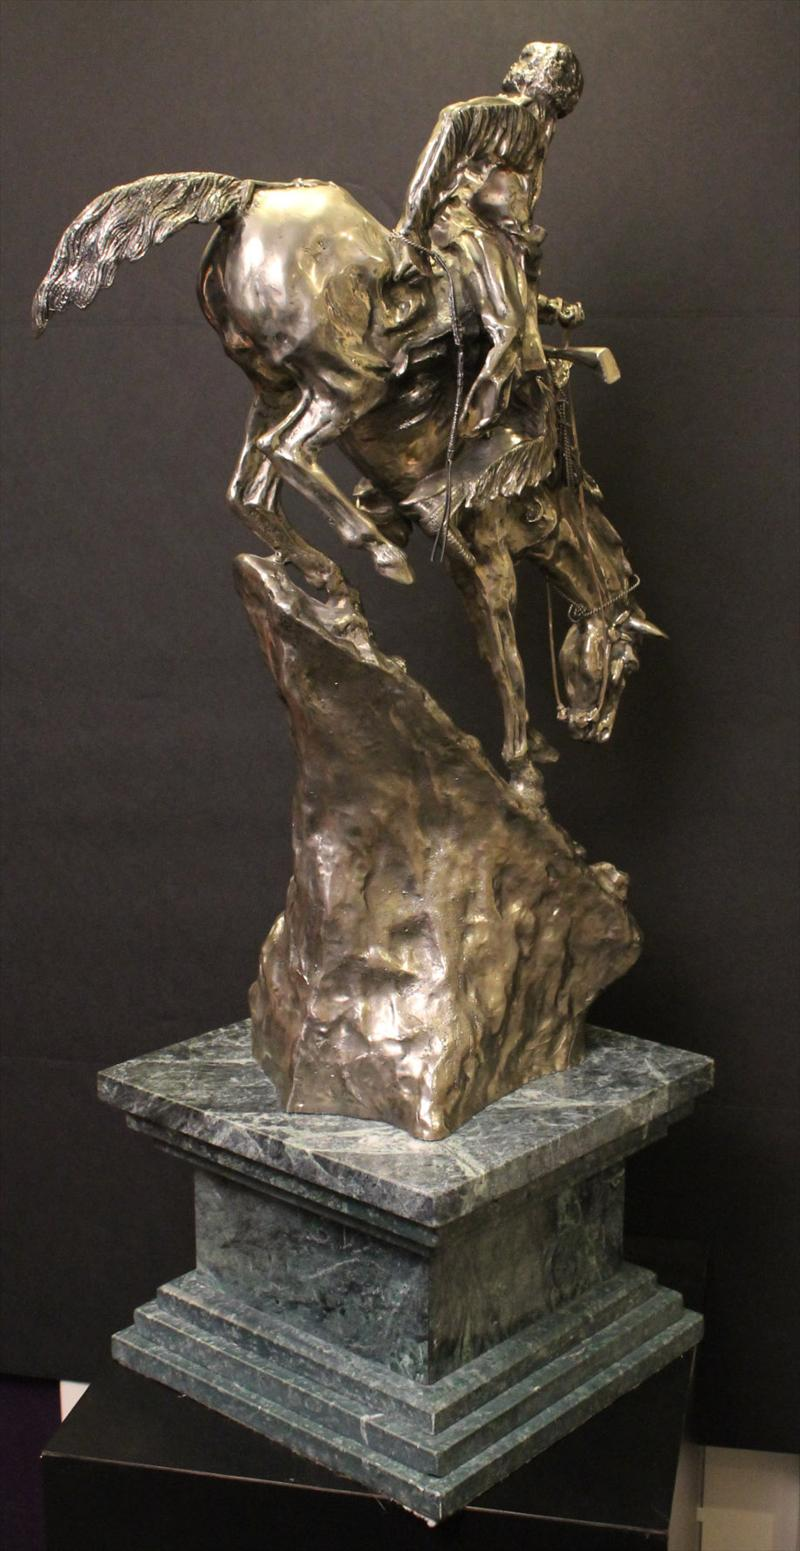 Igavel Auctions Cast 999 Silver Sculpture Quot Mountain Man